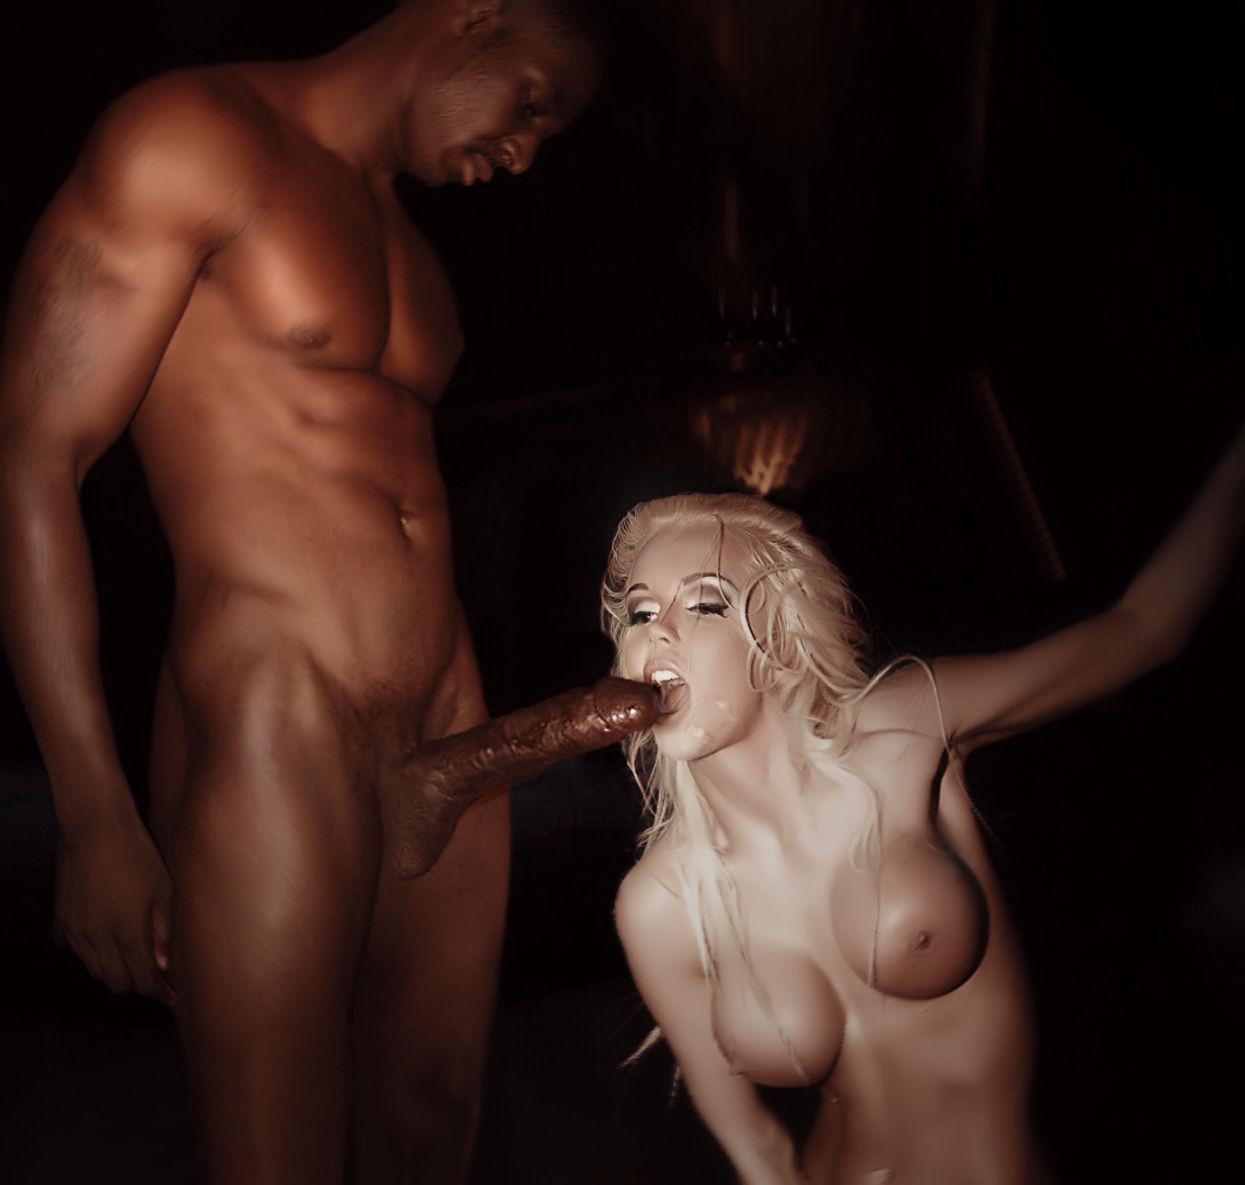 Катя самбука фото порно — 9